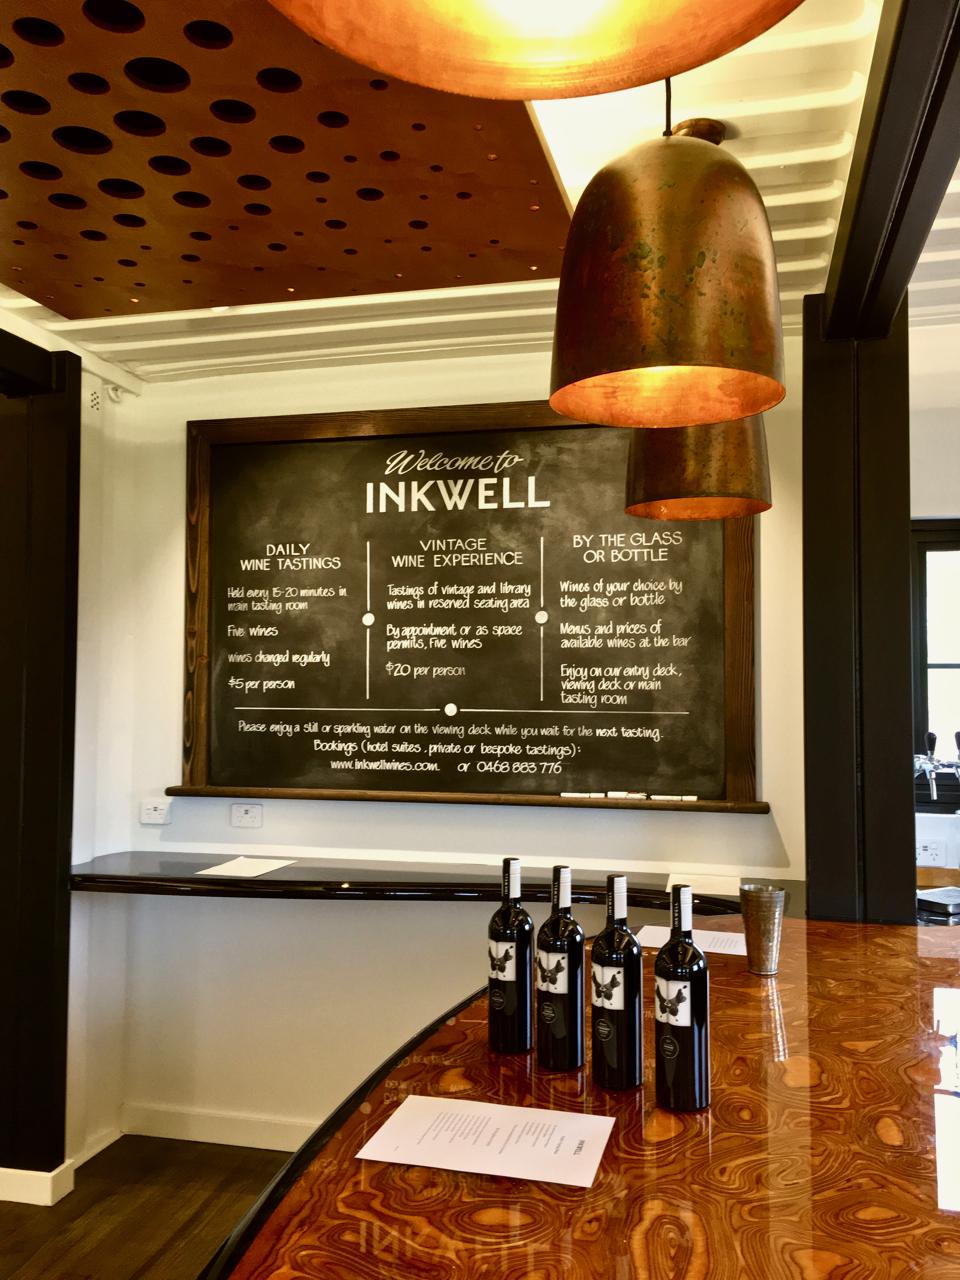 Inkwell Wines cellar door tasting rooms